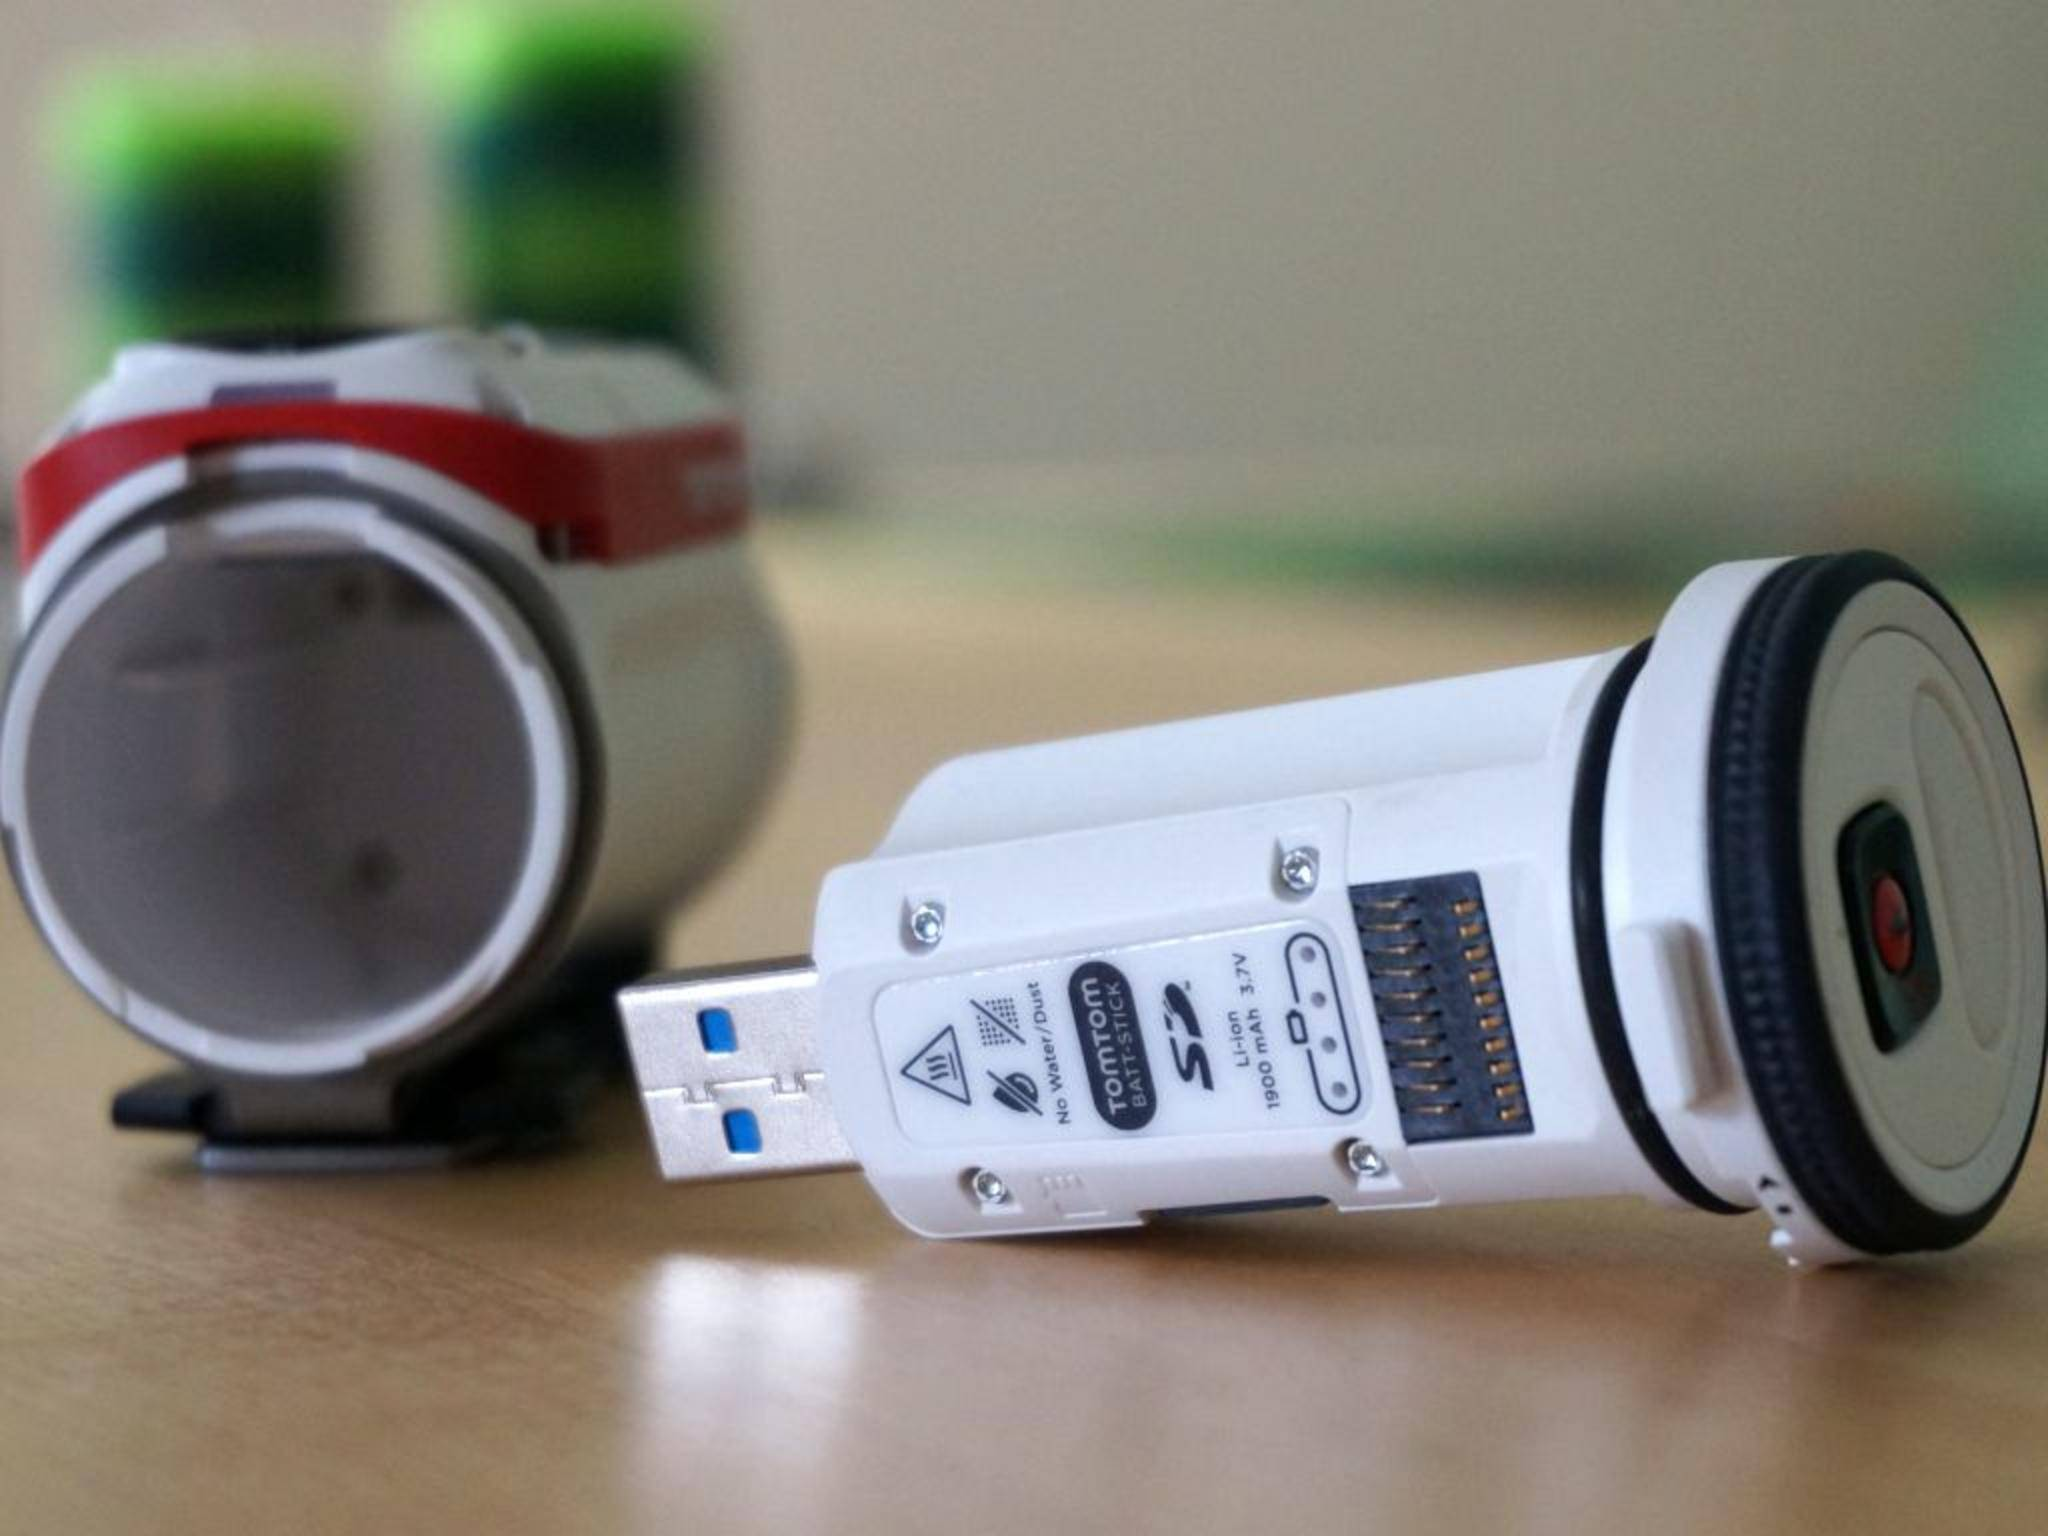 In ihm kommt auch die MicroSD-Karte unter.